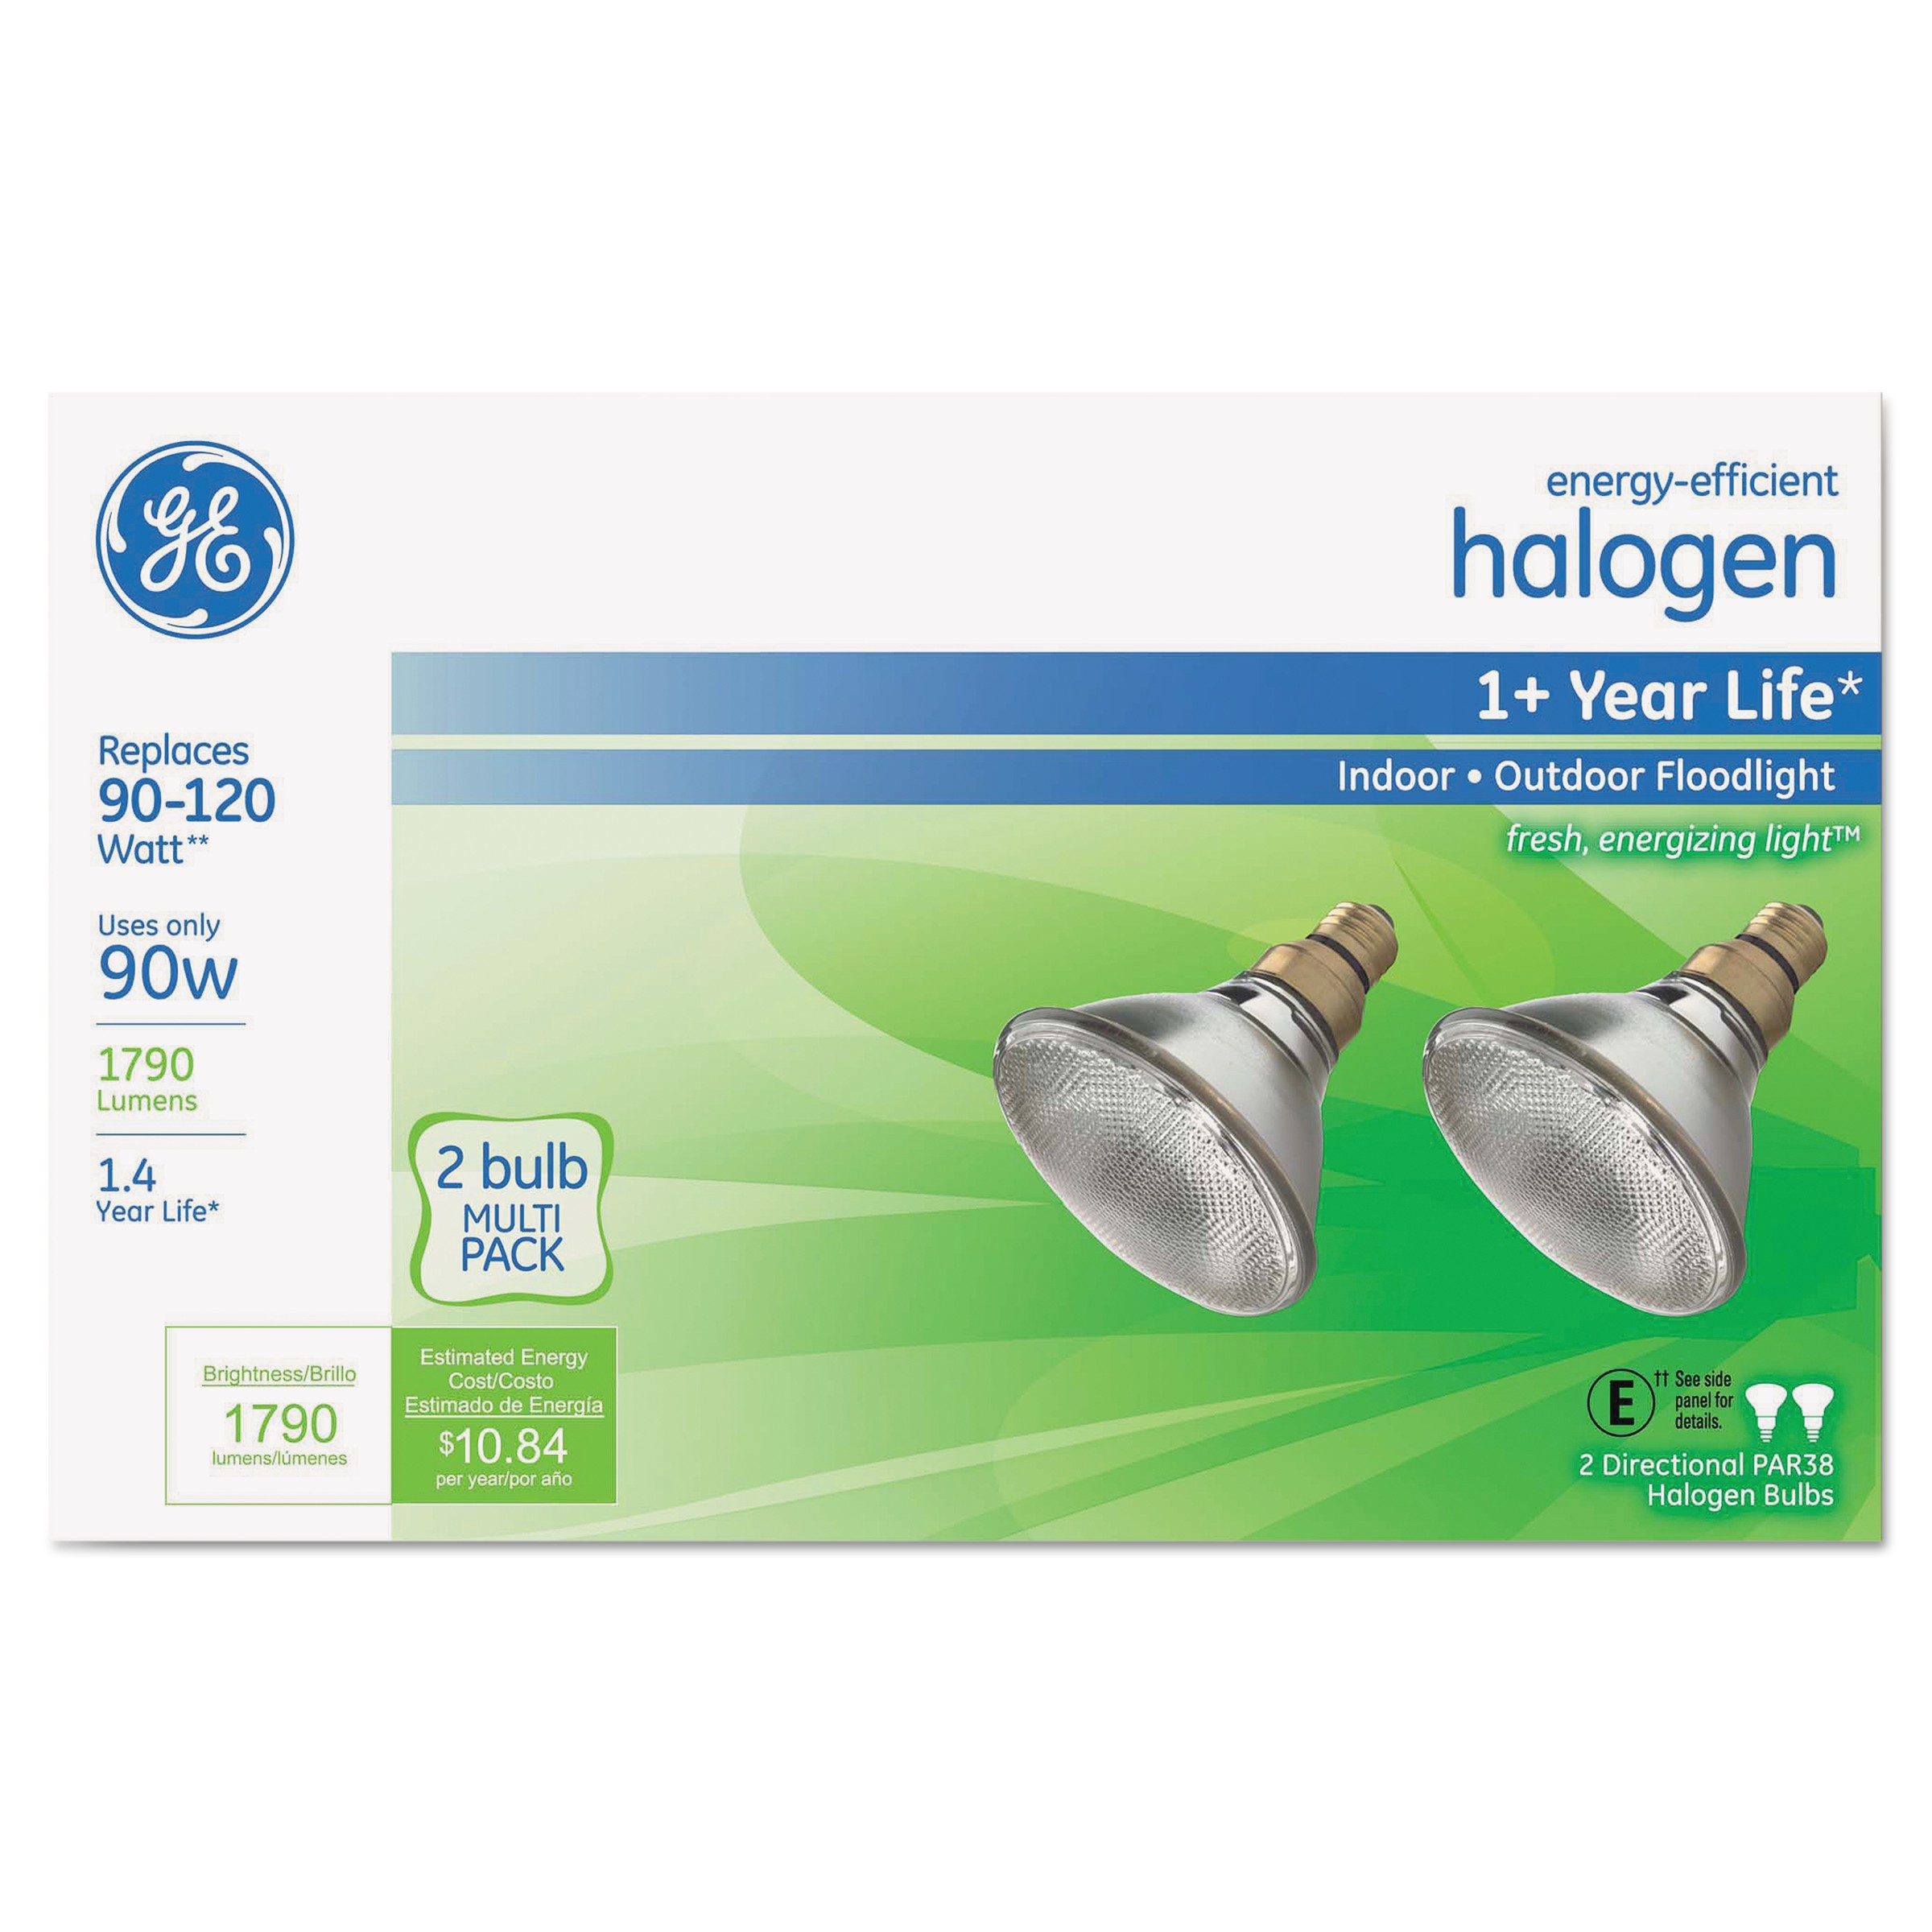 GE 90W PAR38 Halogen Outdoor Floodlight, 2-pack